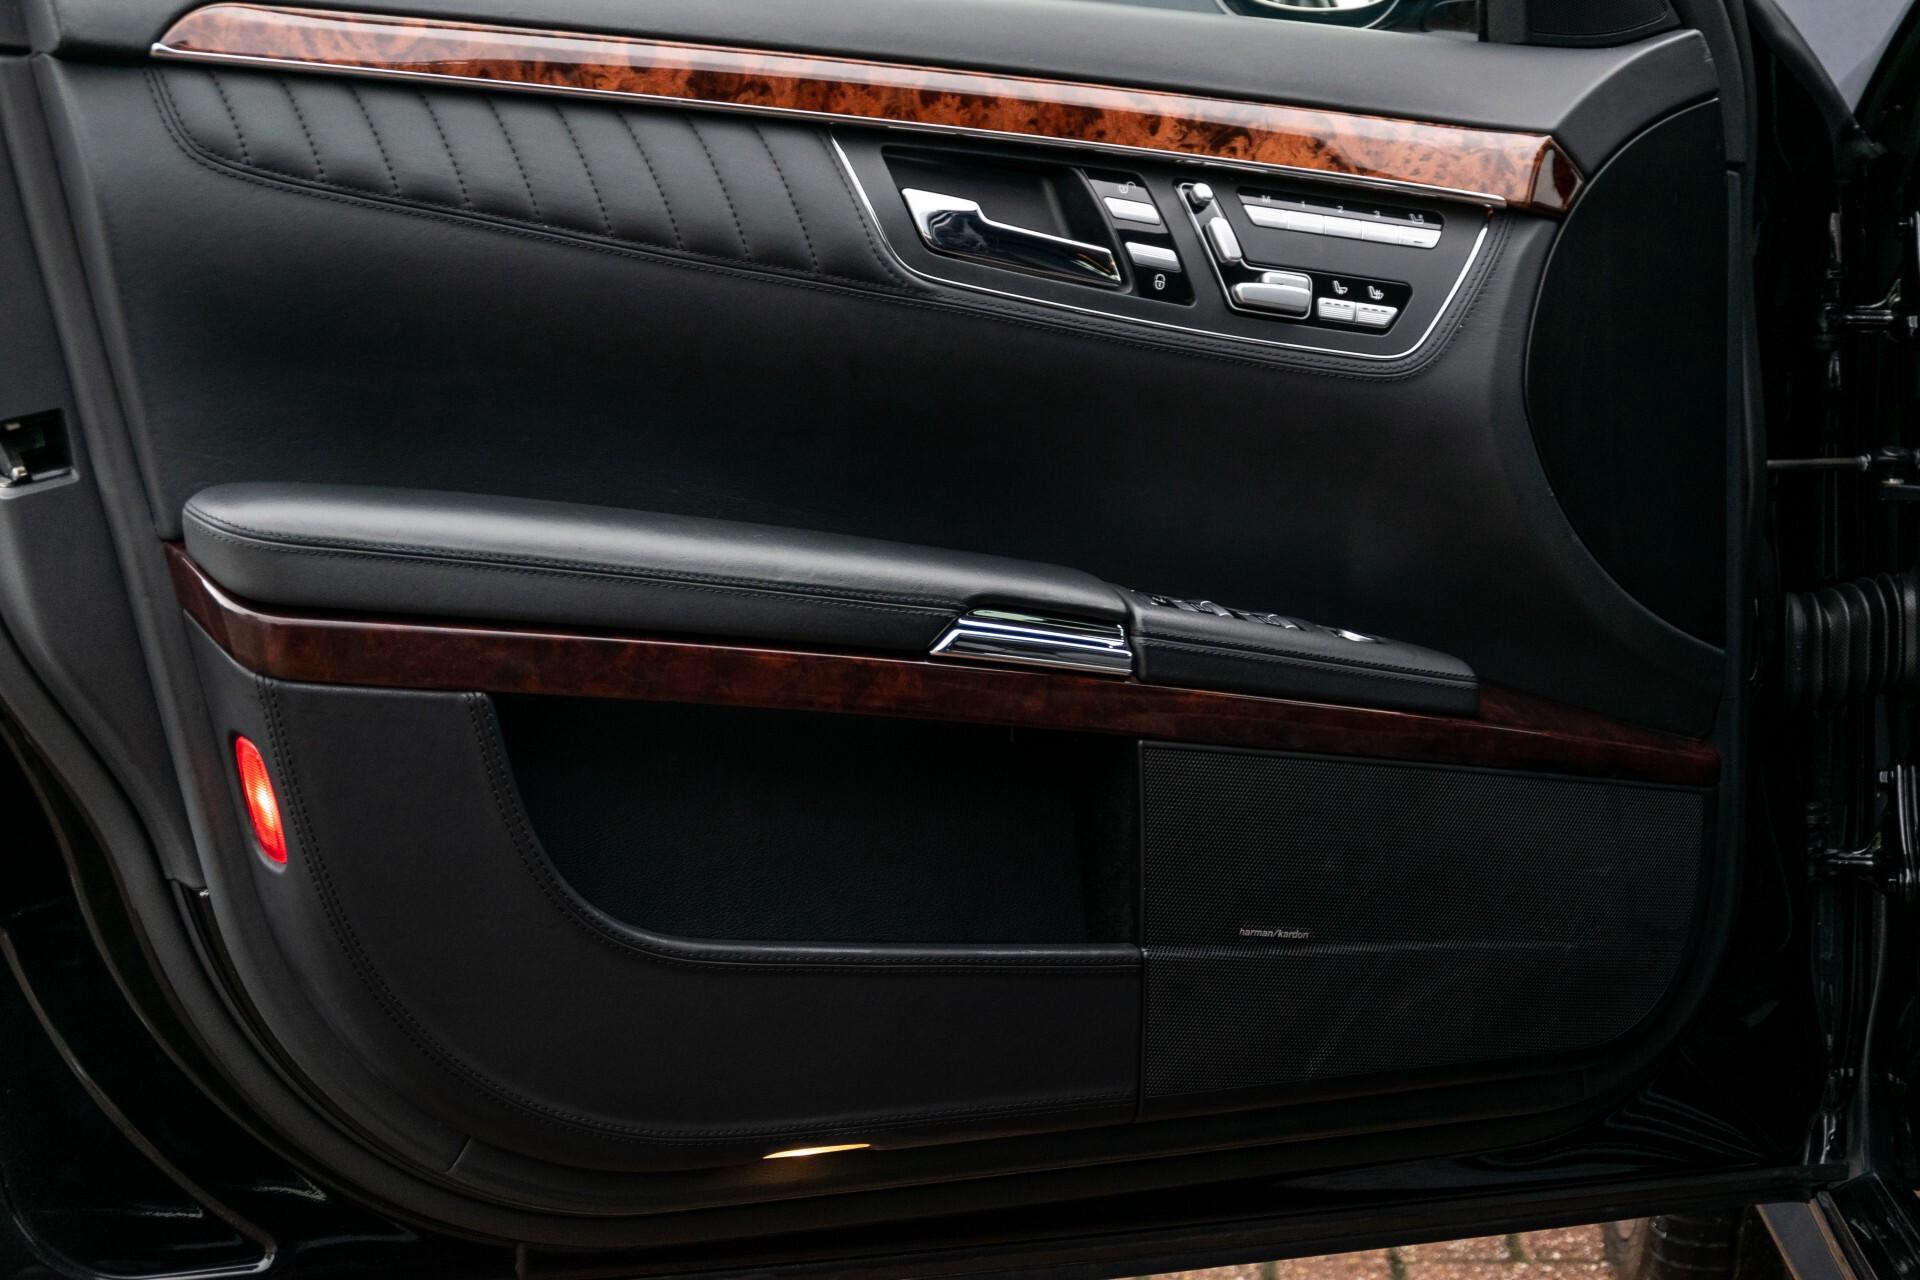 Mercedes-Benz S-Klasse 600 Lang 65 AMG Bi-Turbo Prestige Plus Aut5 Foto 18